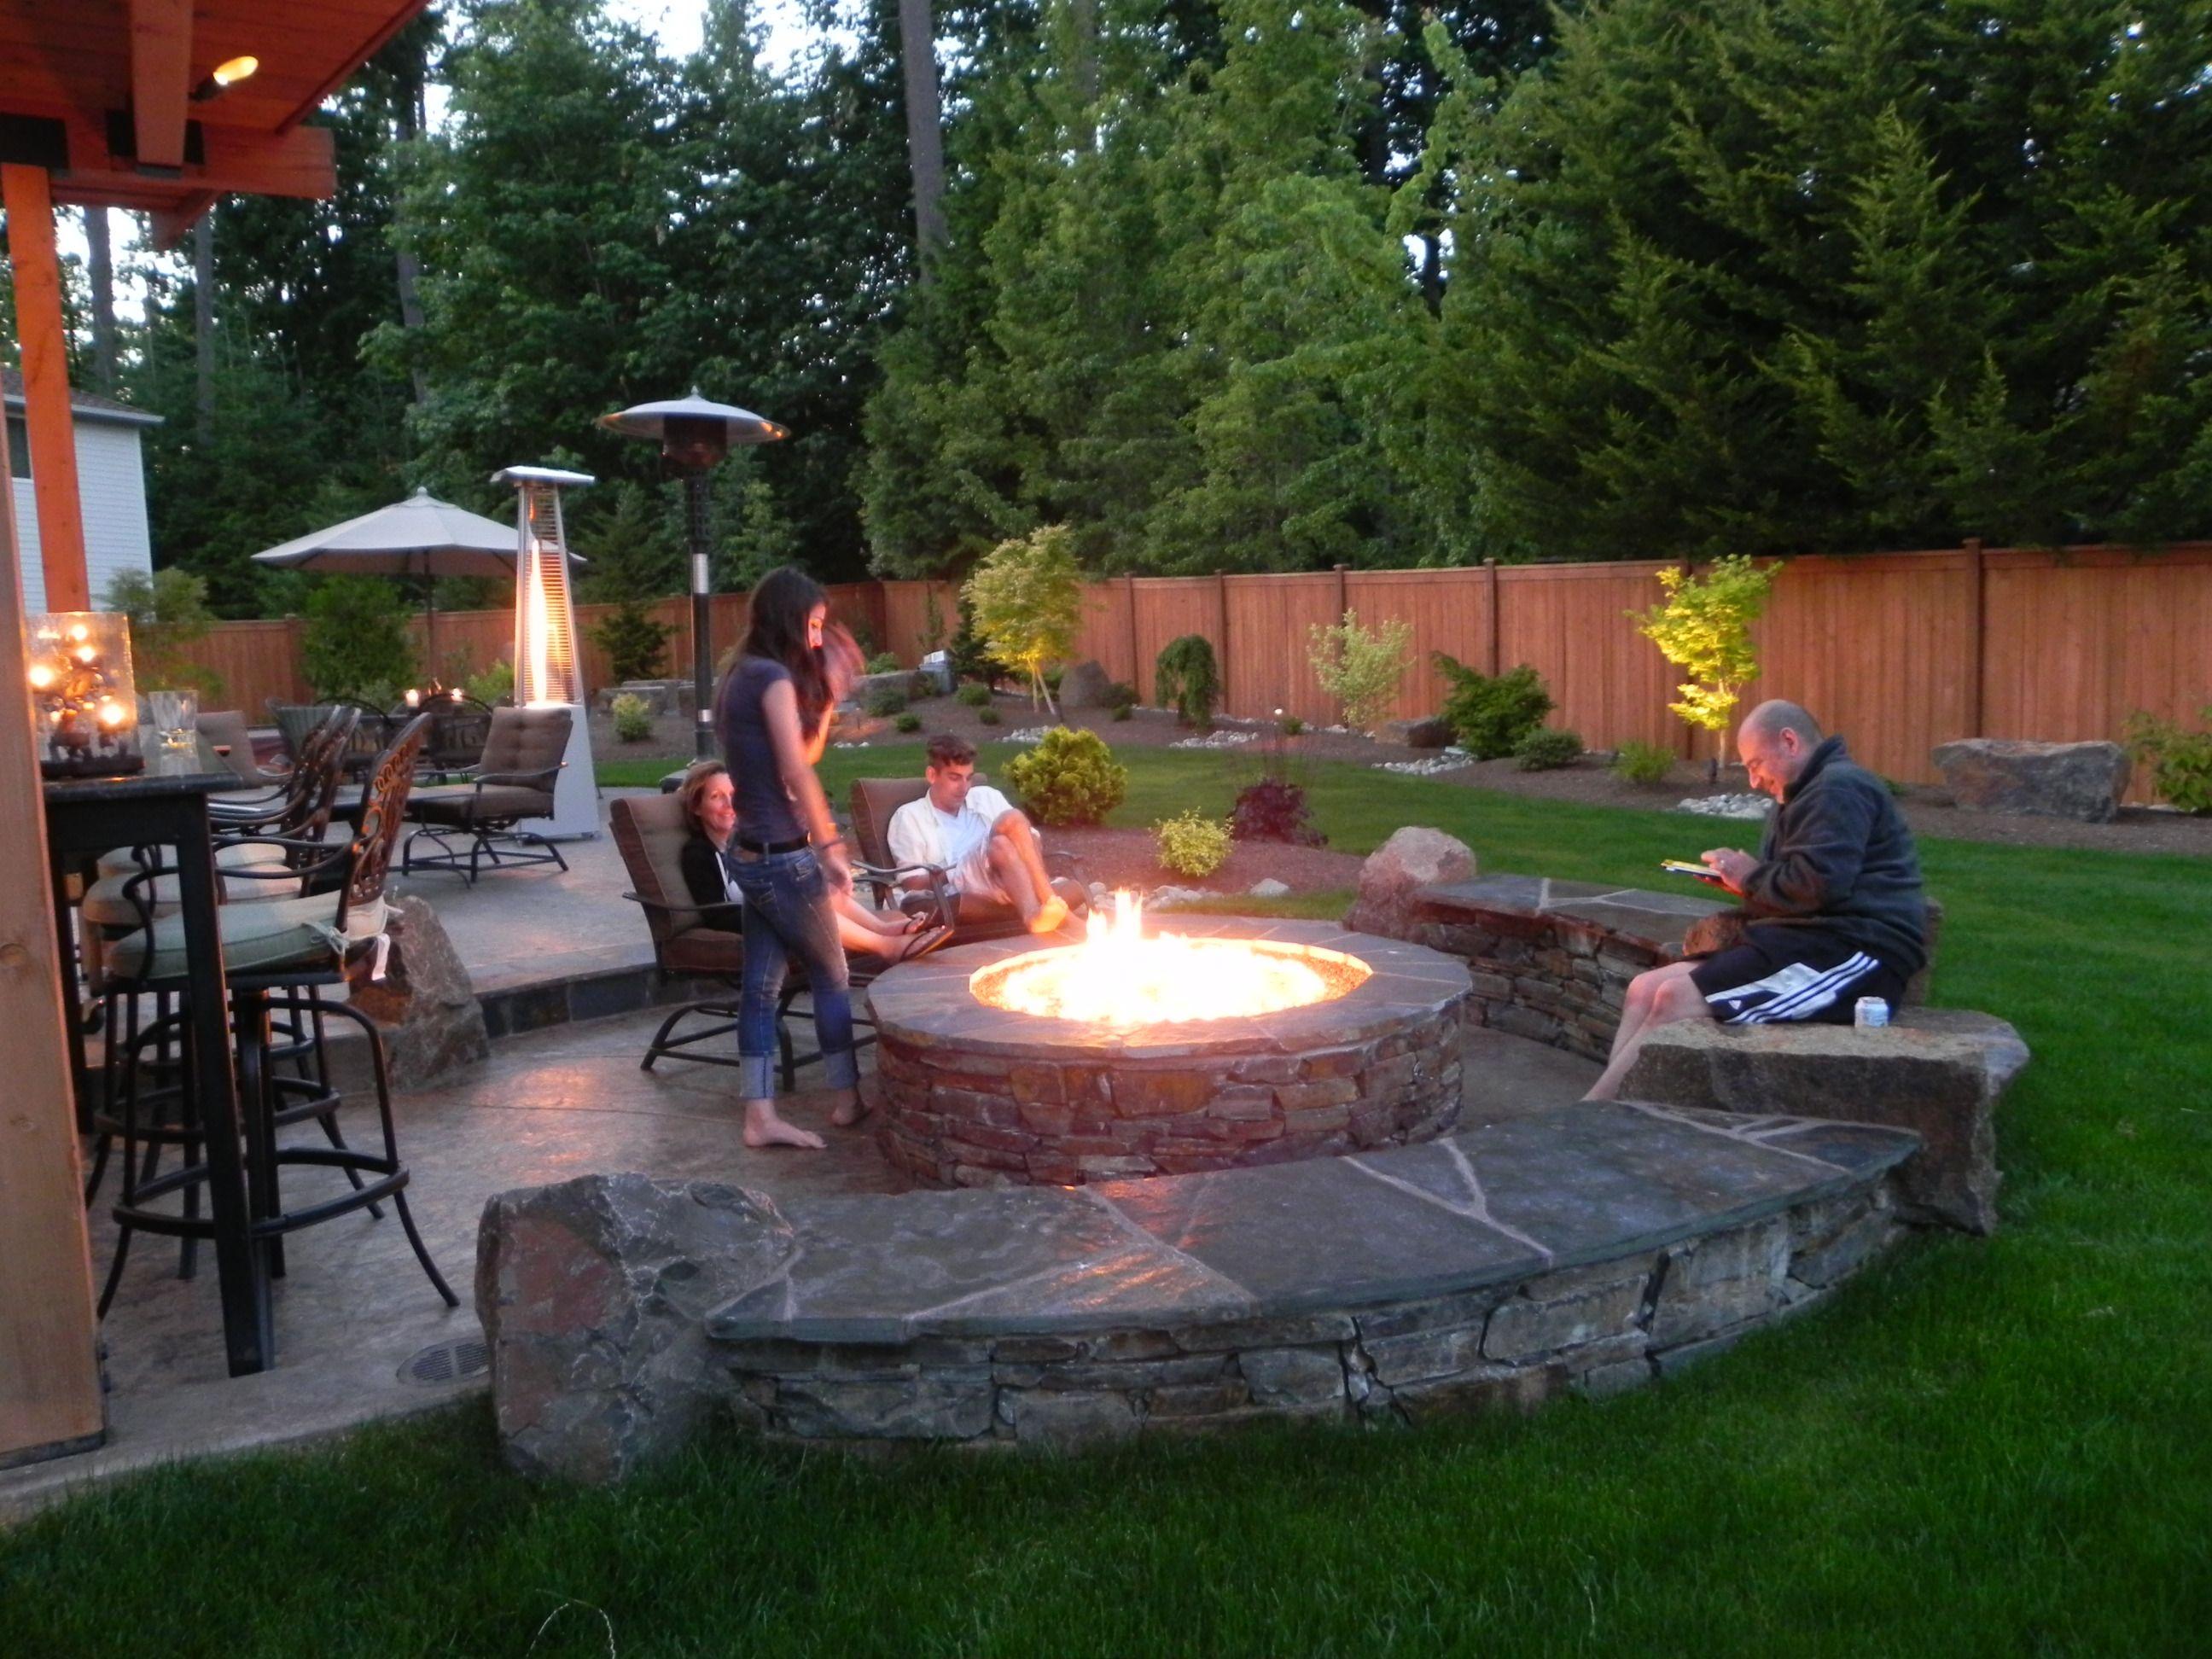 Fireplace Or Fire Pit Backyard Ideas Fire Pit Patio Fire Pit regarding dimensions 2592 X 1944